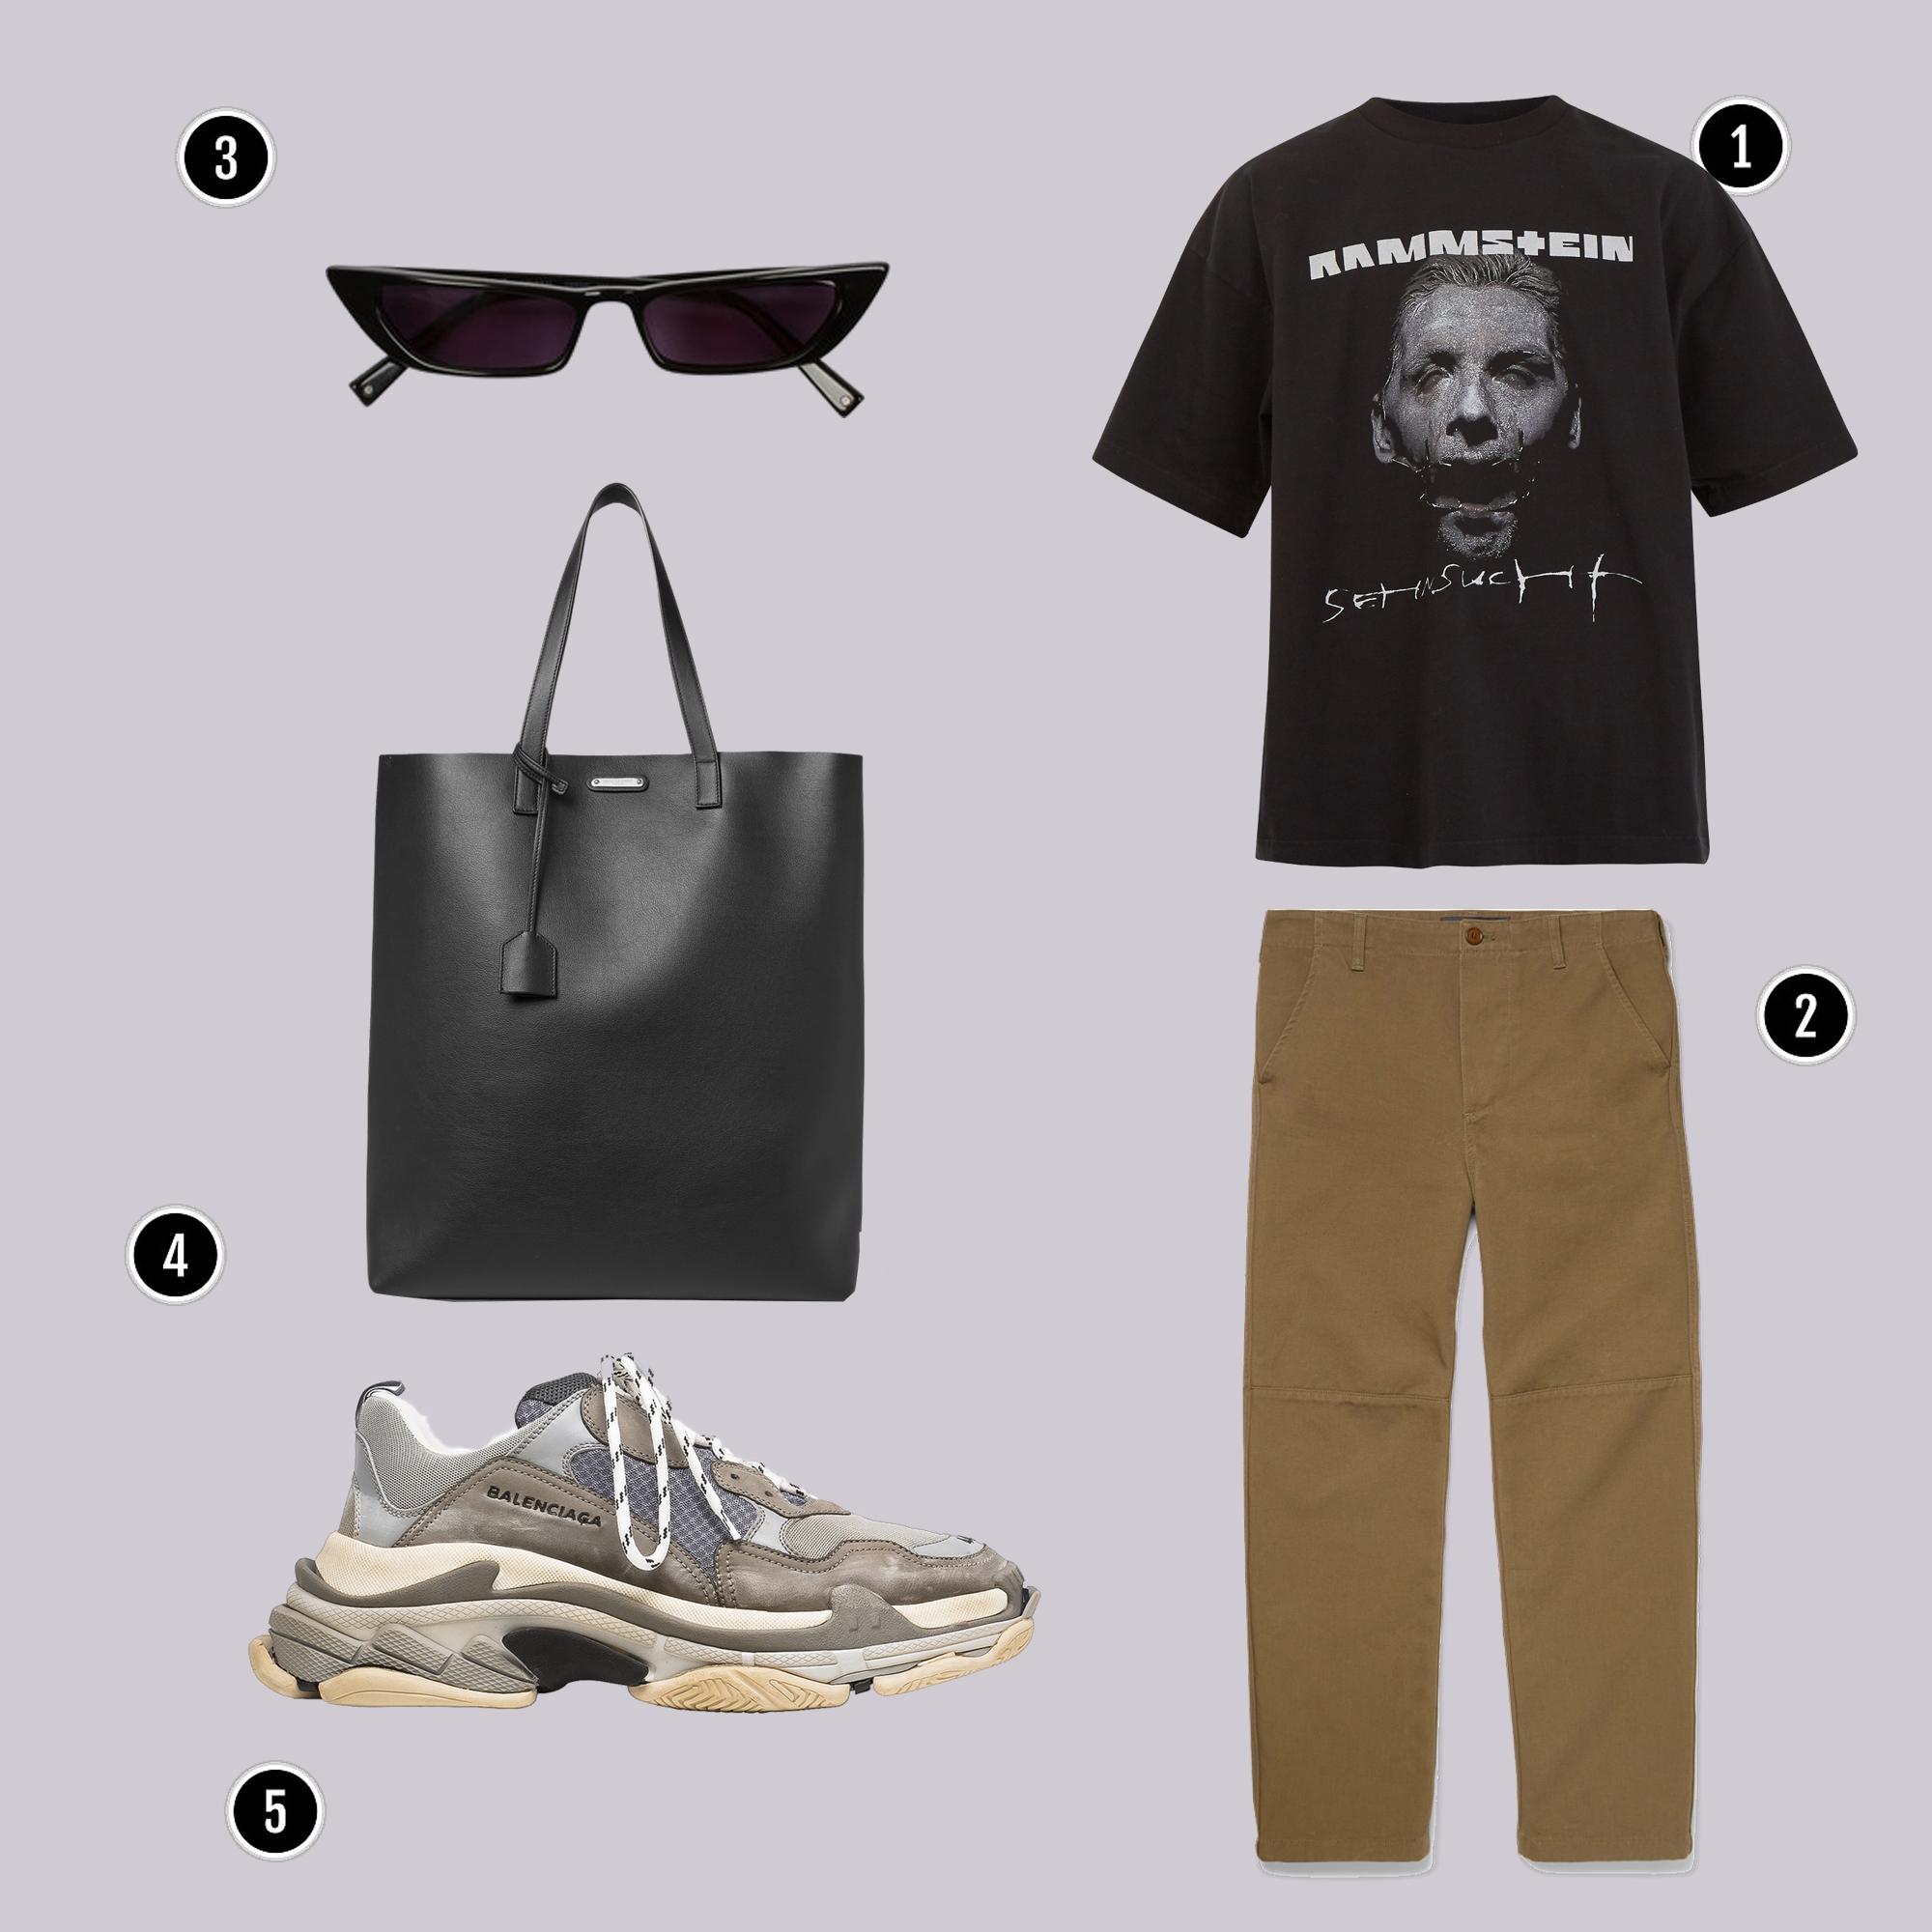 1. Áo: Vetements / 2. Quần: Balenciaga / 3. Kính: Kylie / 4. Túi : YSL / 5. Giày: Balenciaga